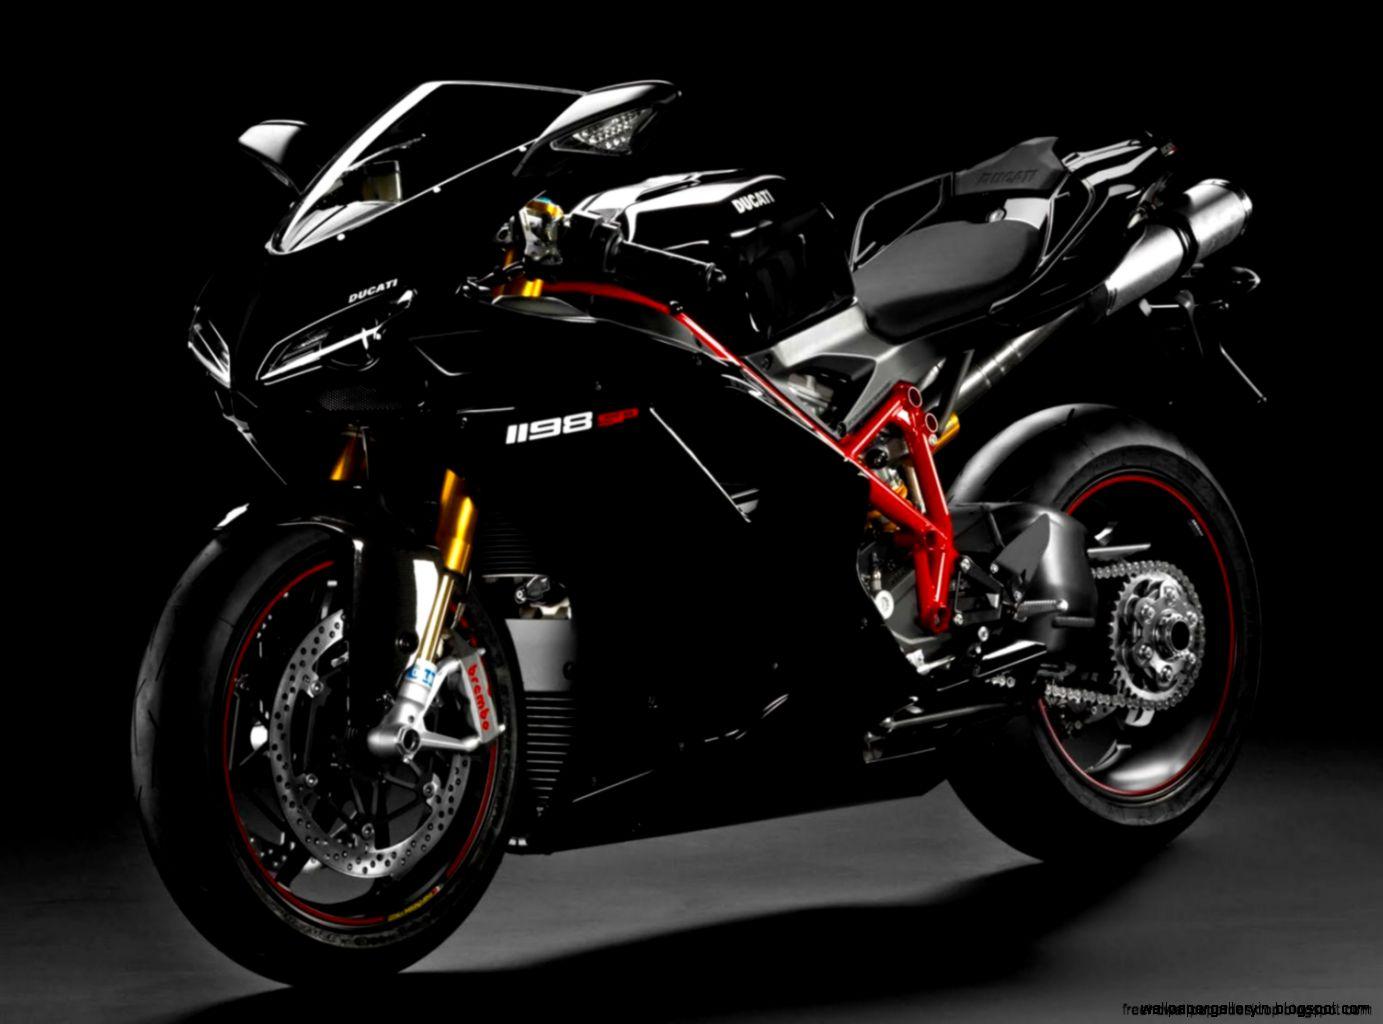 Ducati Superbike 1198 Hd Wallpaper Background  Free High